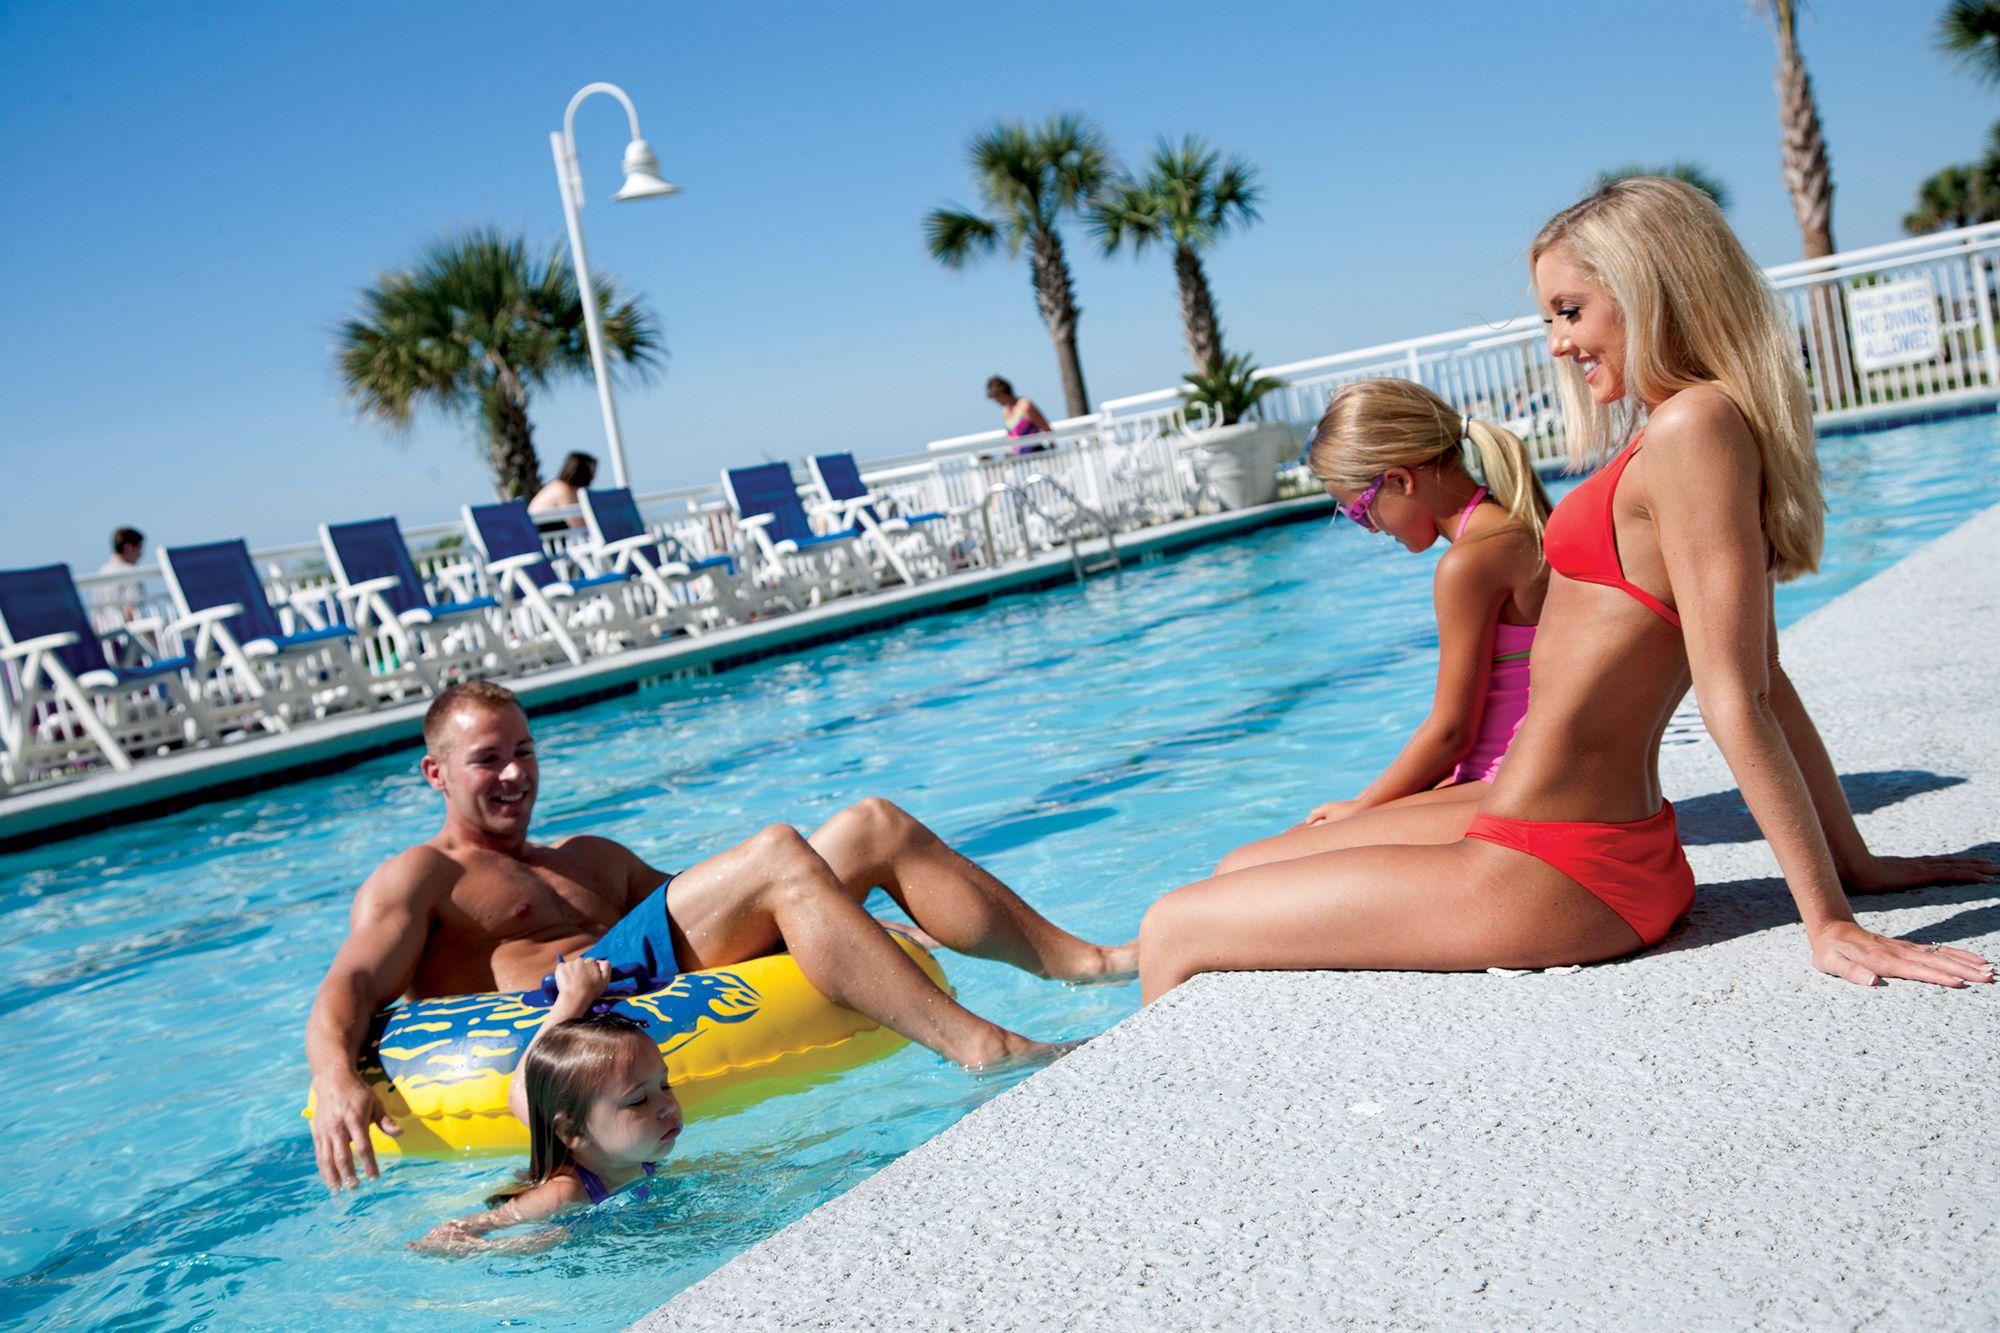 Paradise Resort in Myrtle Beach, SC